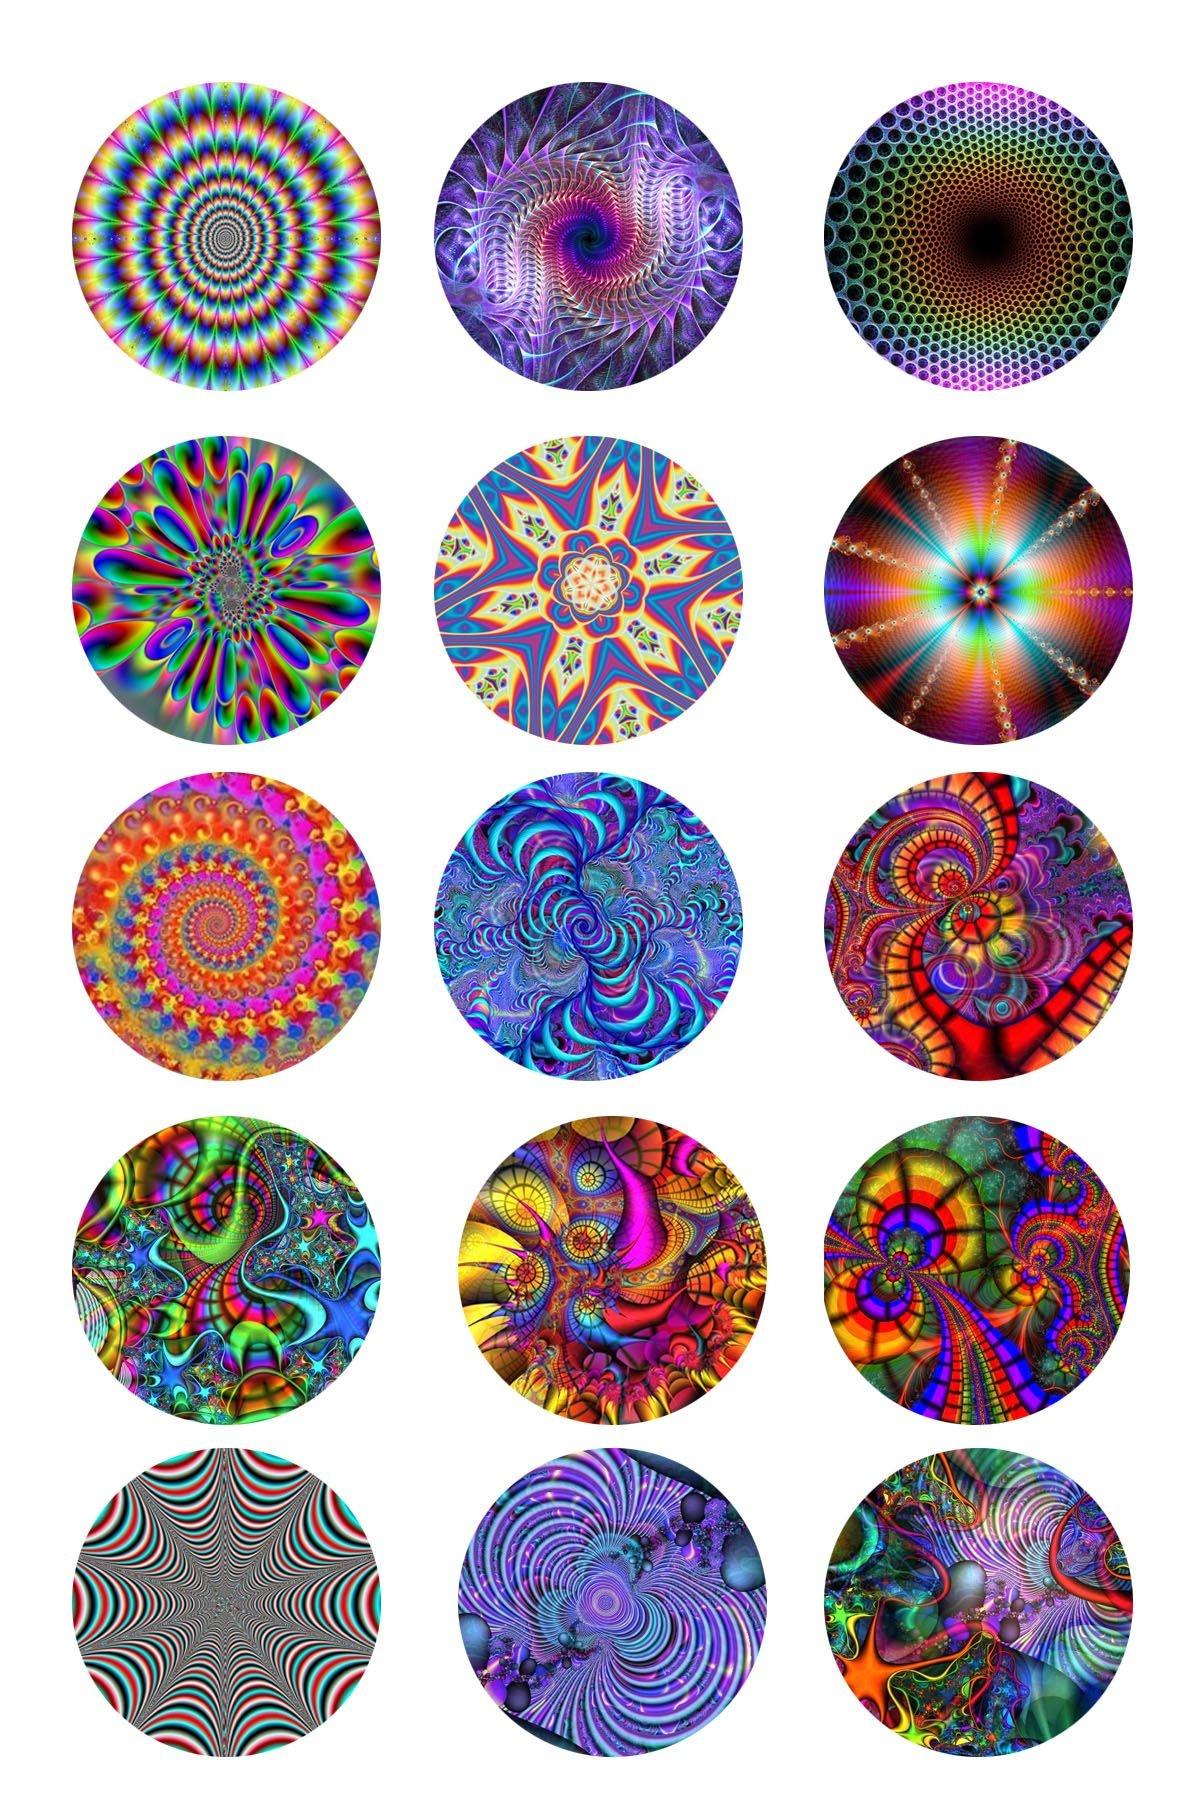 Tye Dye Bottle Cap Images | Collage Sheets Designs Patterns Prints - Free Printable Cabochon Templates